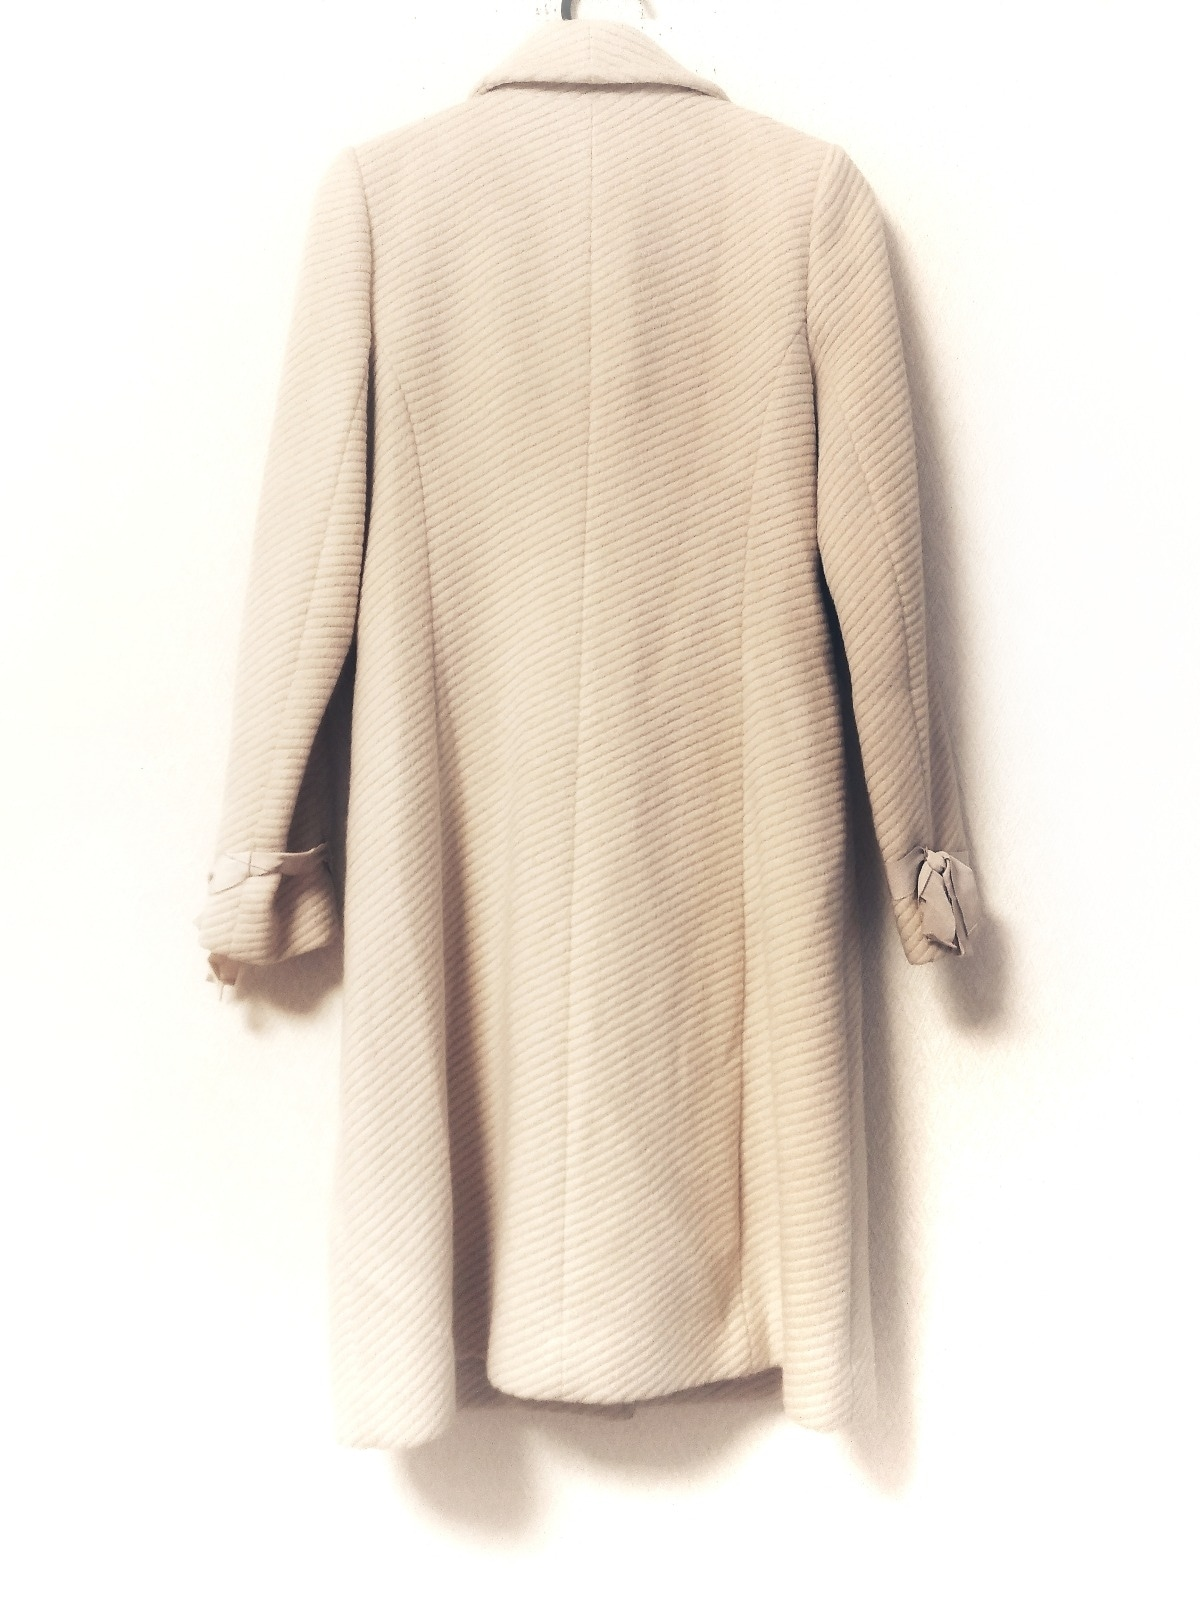 rebecca taylor(レベッカテイラー)のコート